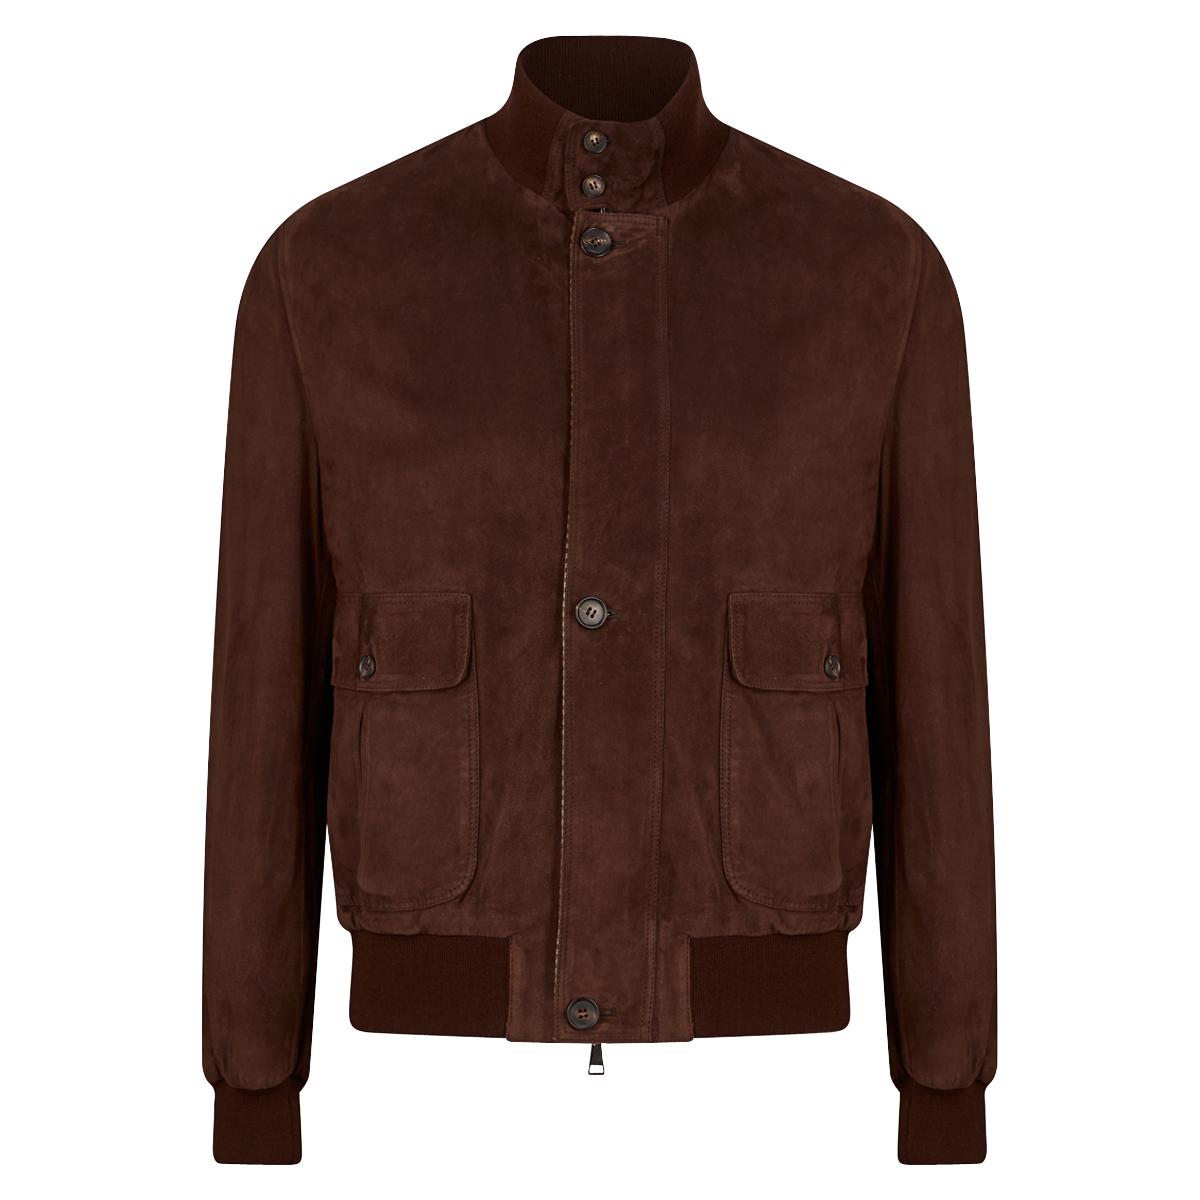 Brown Suede A1 Jacket